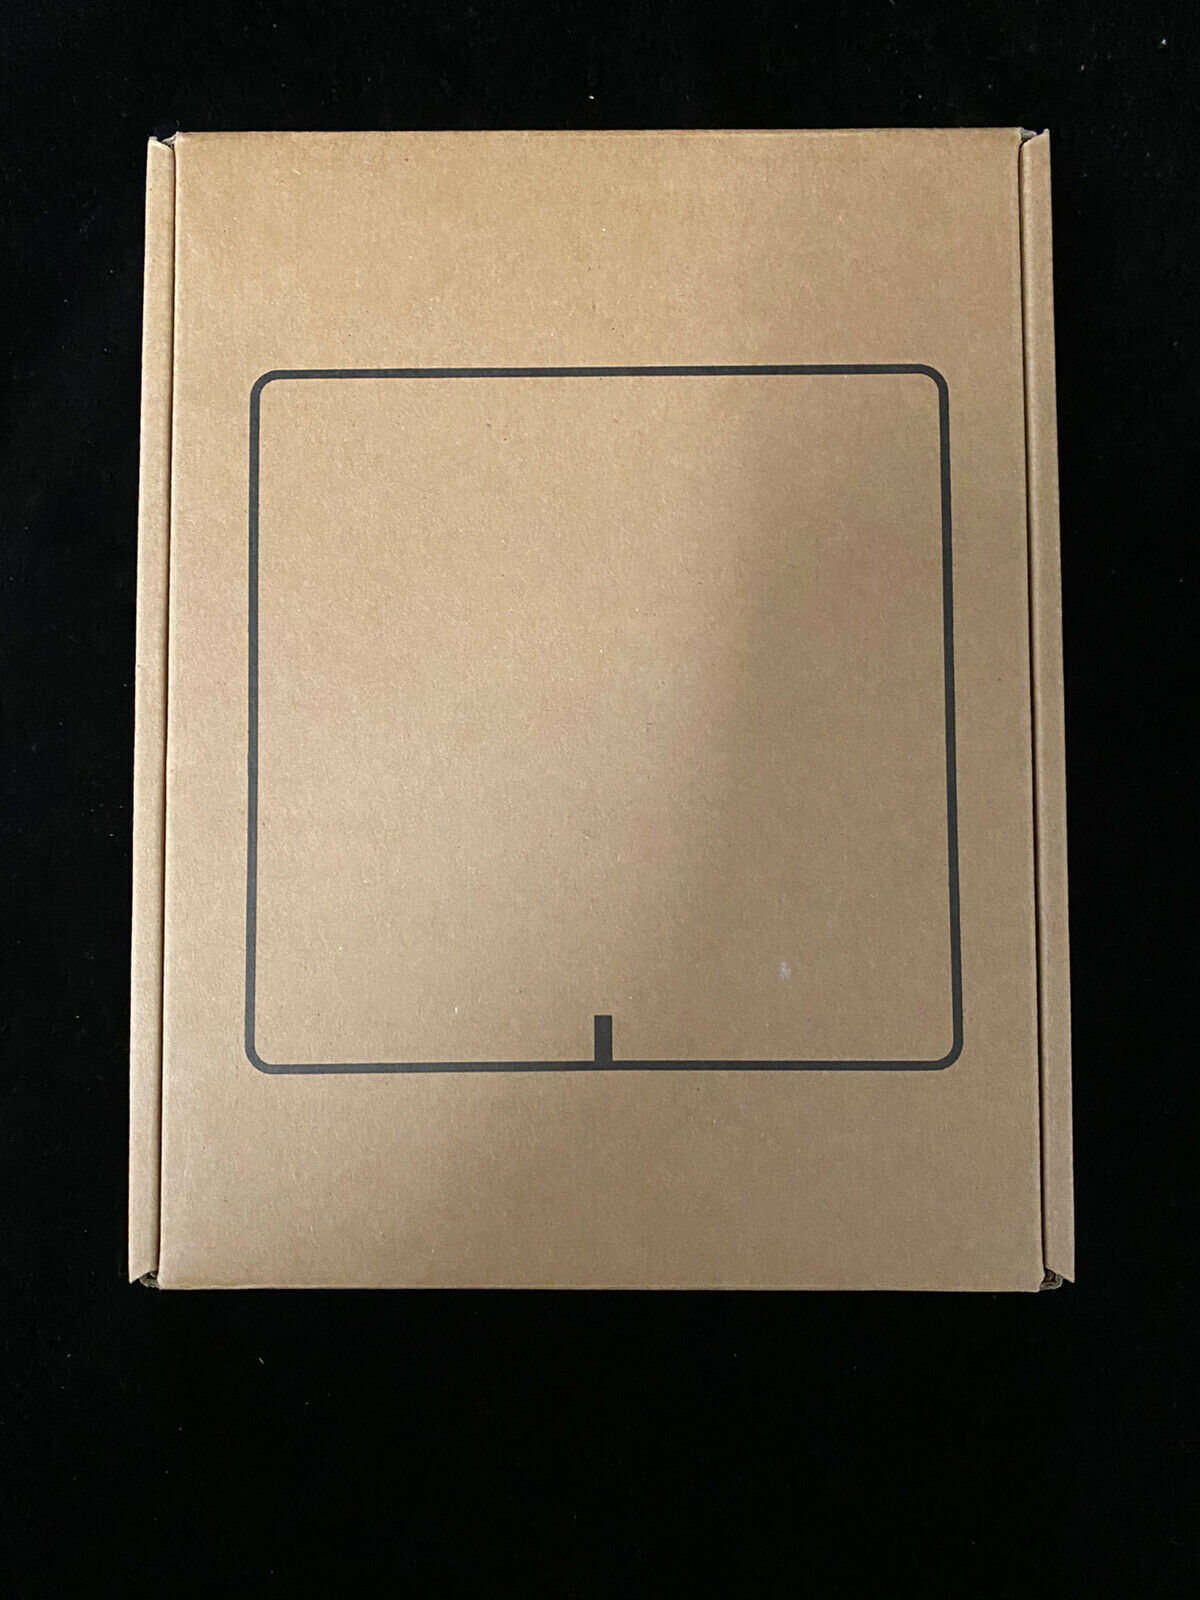 New Open Box Sonos Port Streaming Media Player Matte Black black box matte media new open player port sonos streaming